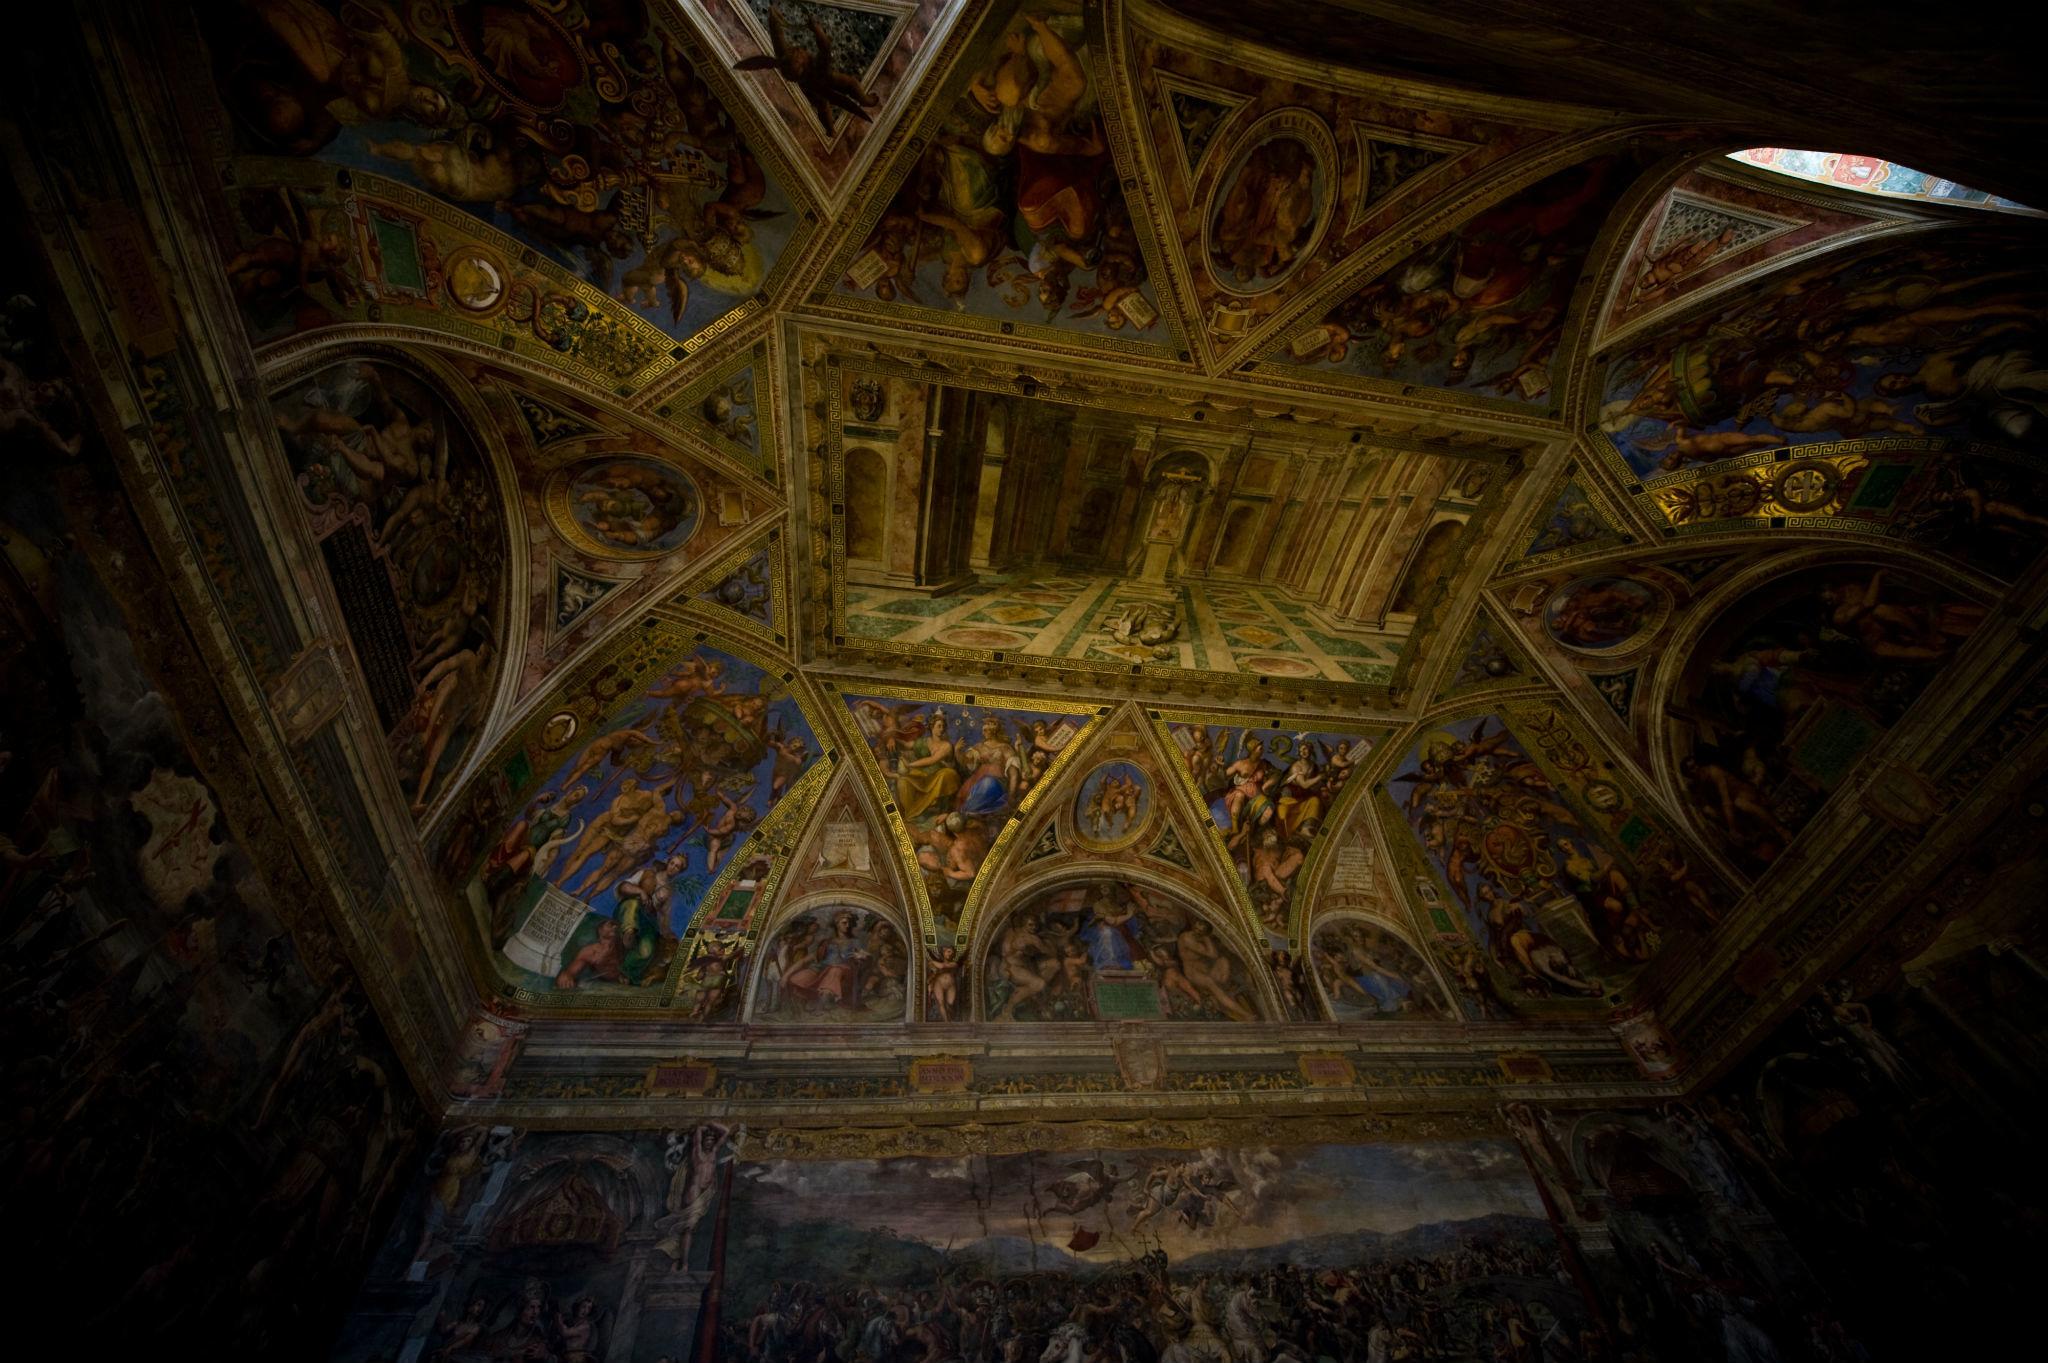 Sistine Chapel by night